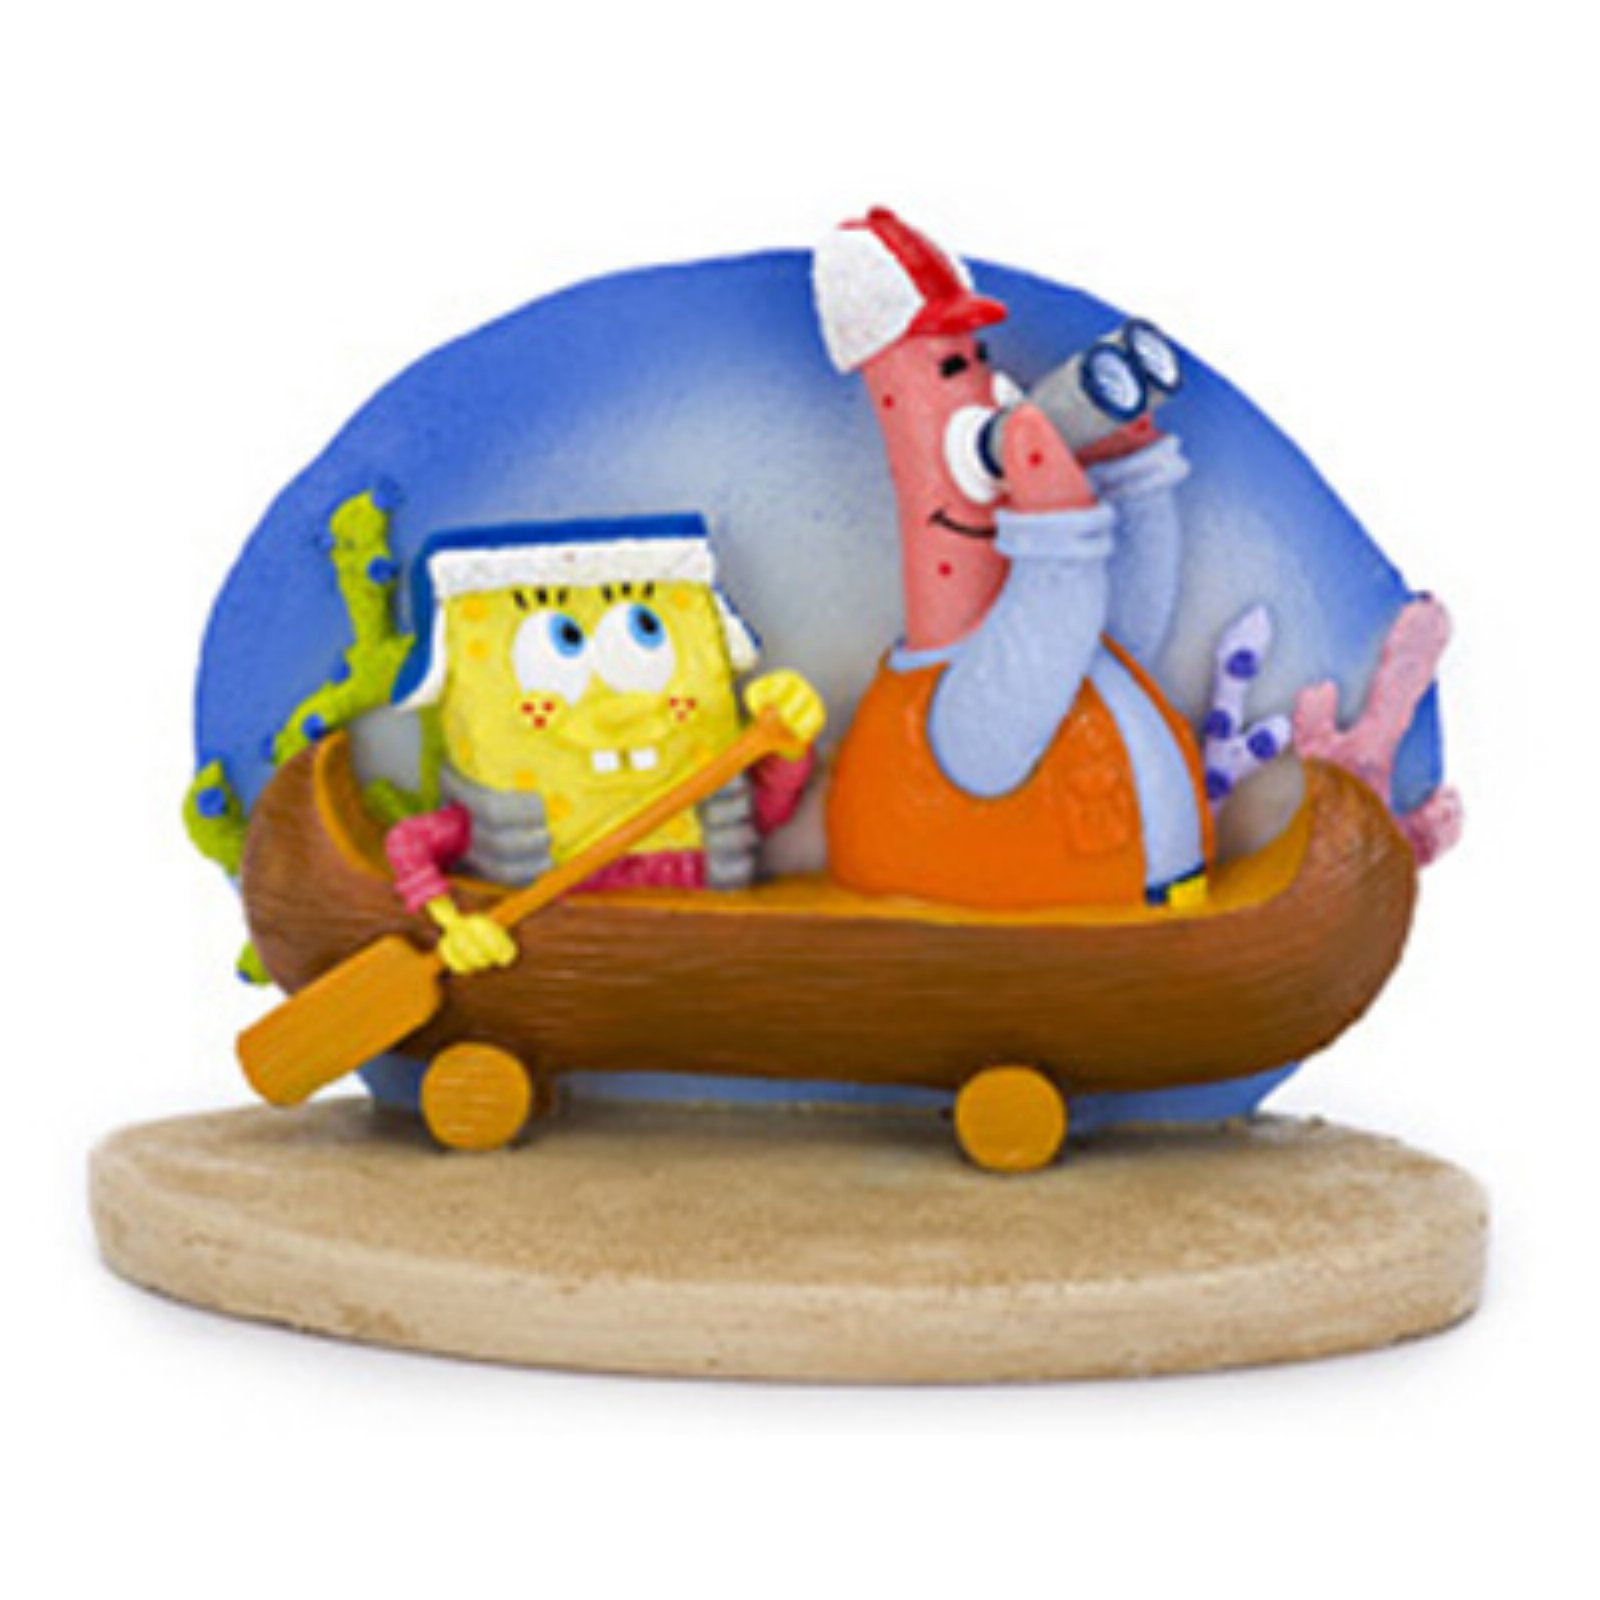 Penn Plax SpongeBob and Patrick in Canoe Aquarium Figure